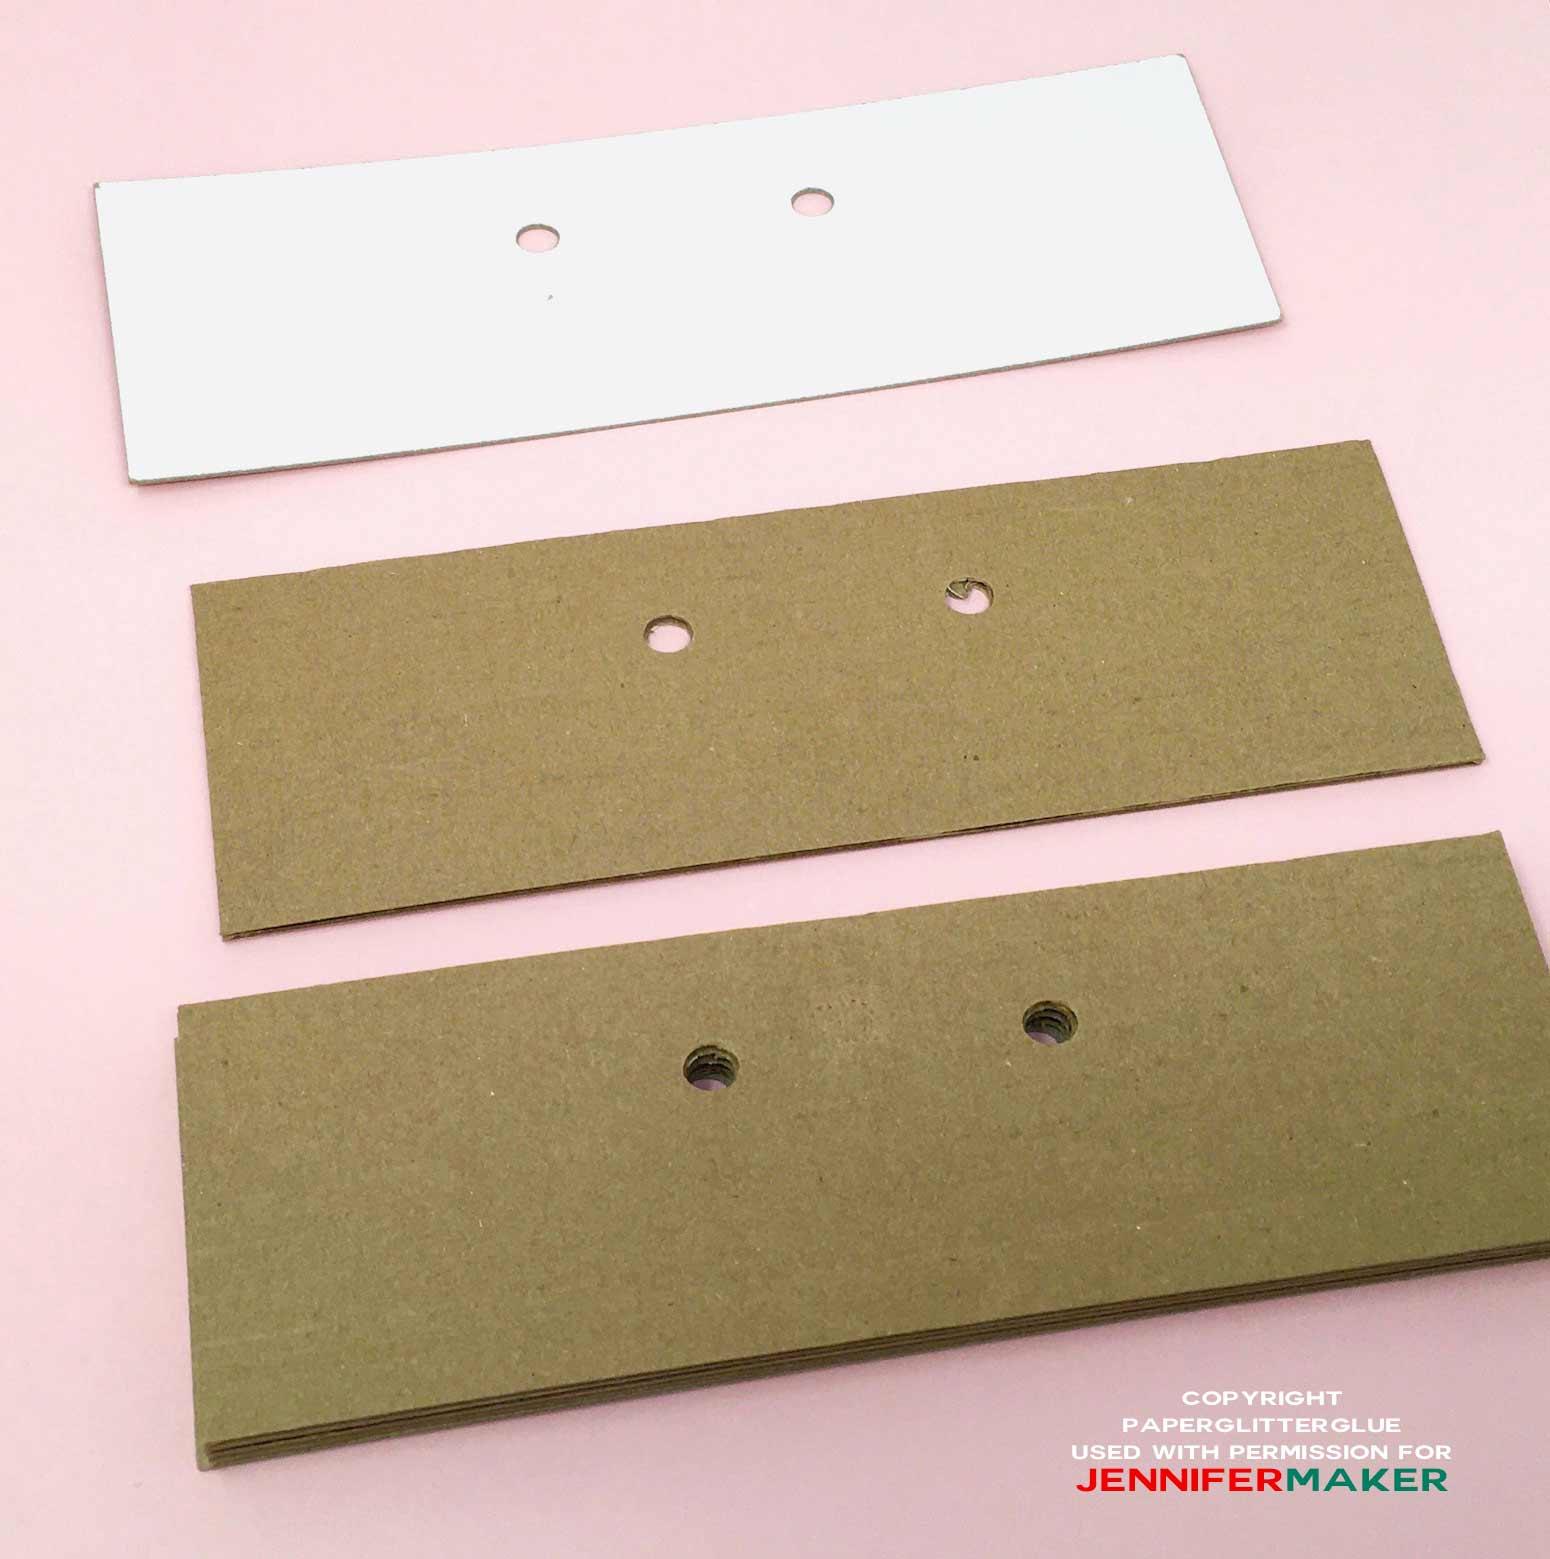 Corrugated cardboard for base of cuckoo clock